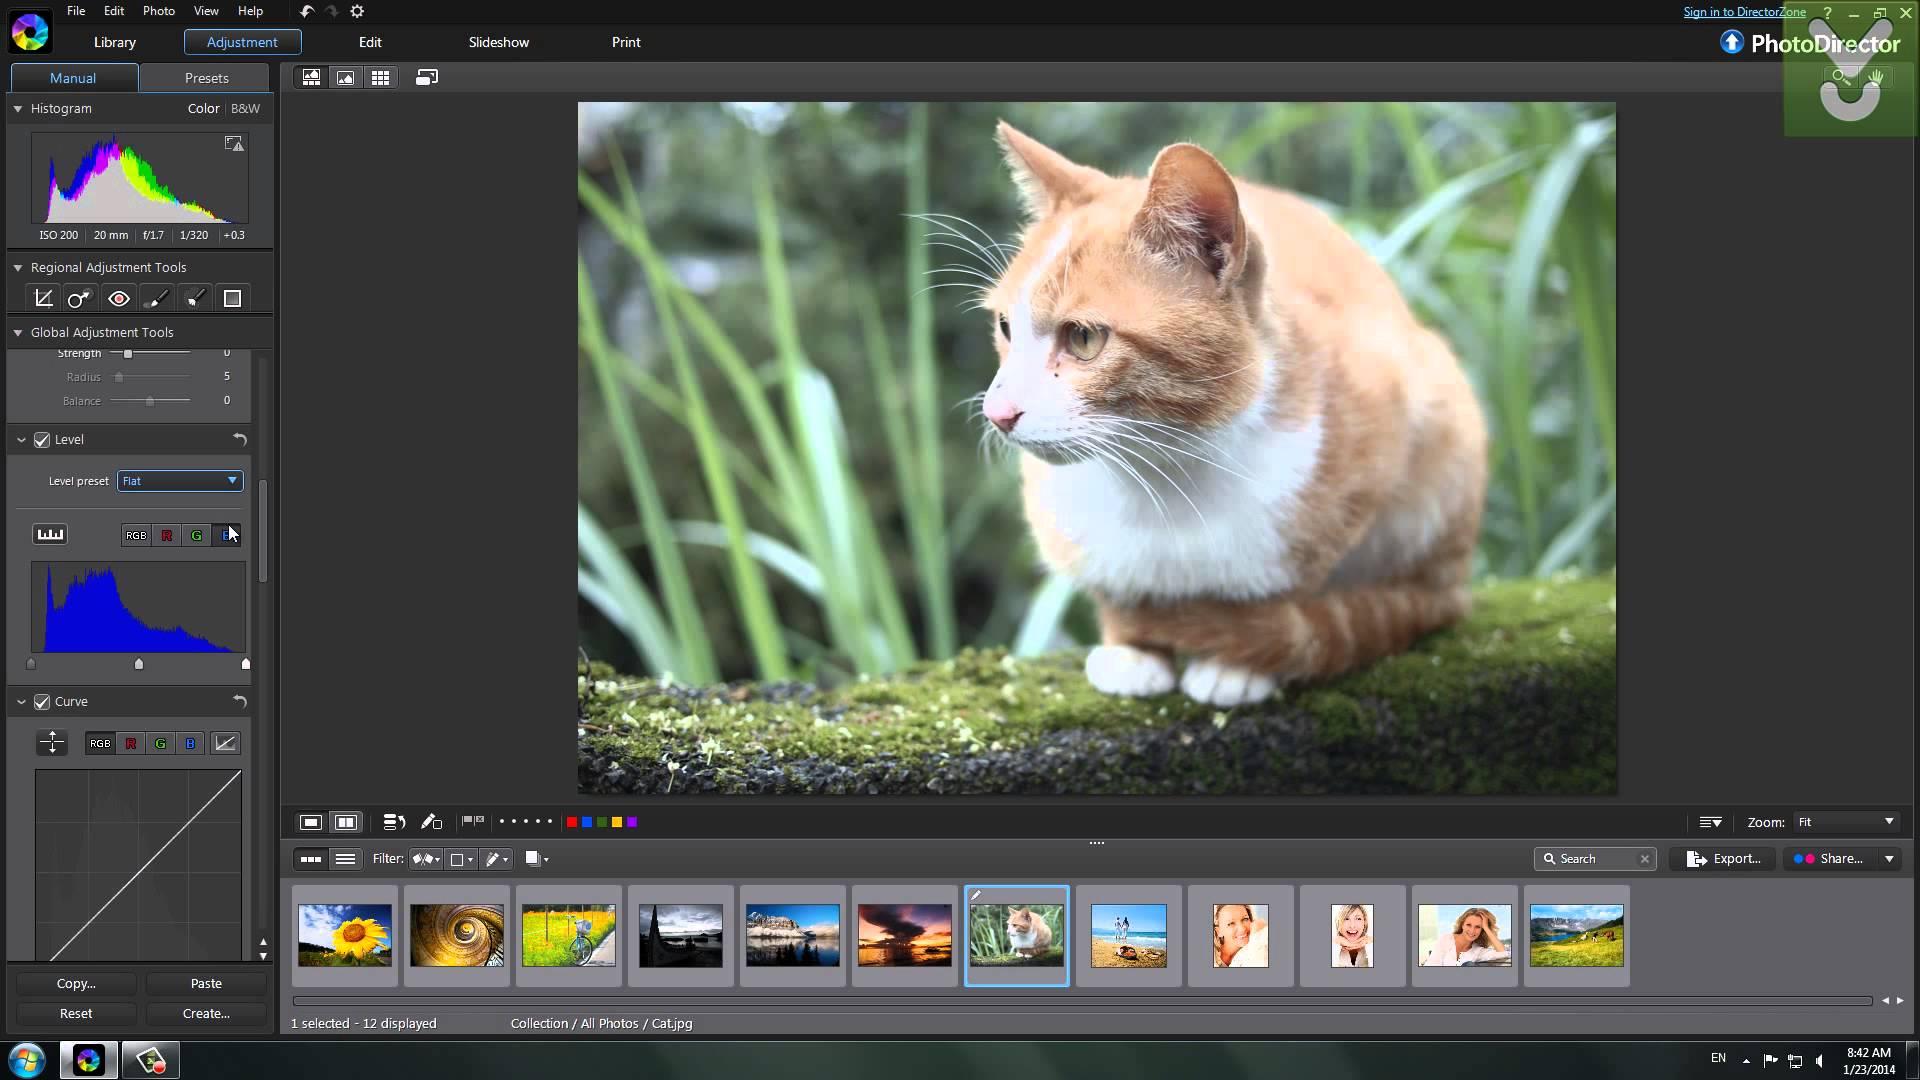 Free photo editing sotware Sony 18-105mm G Lens vs 16-70mm ZA Lens?